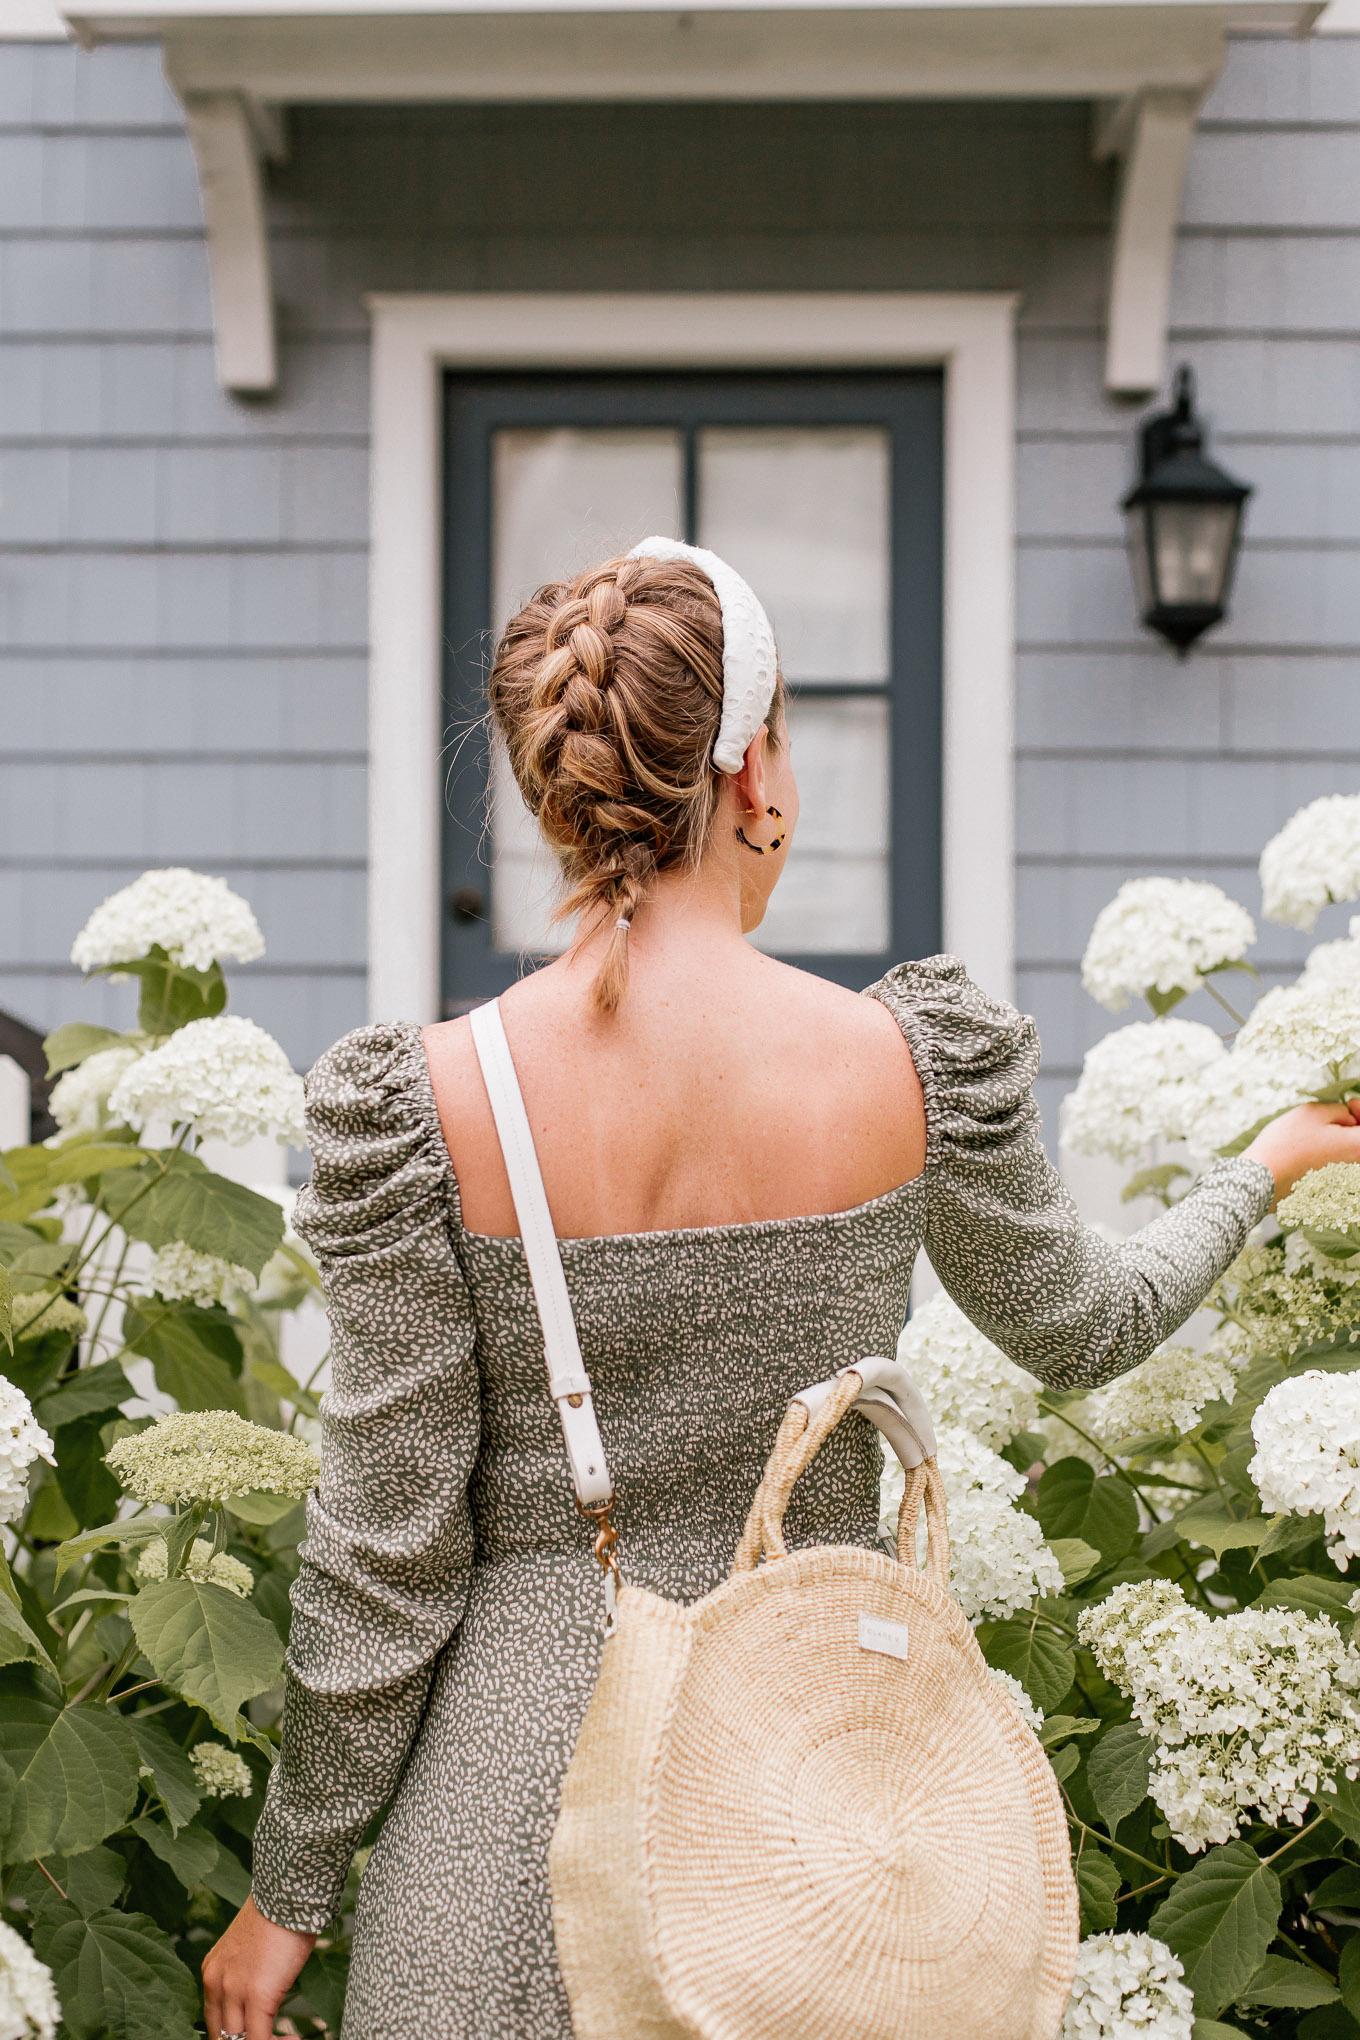 Puff Sleeved Summer Dress, White Eyelet Headband | Louella Reese